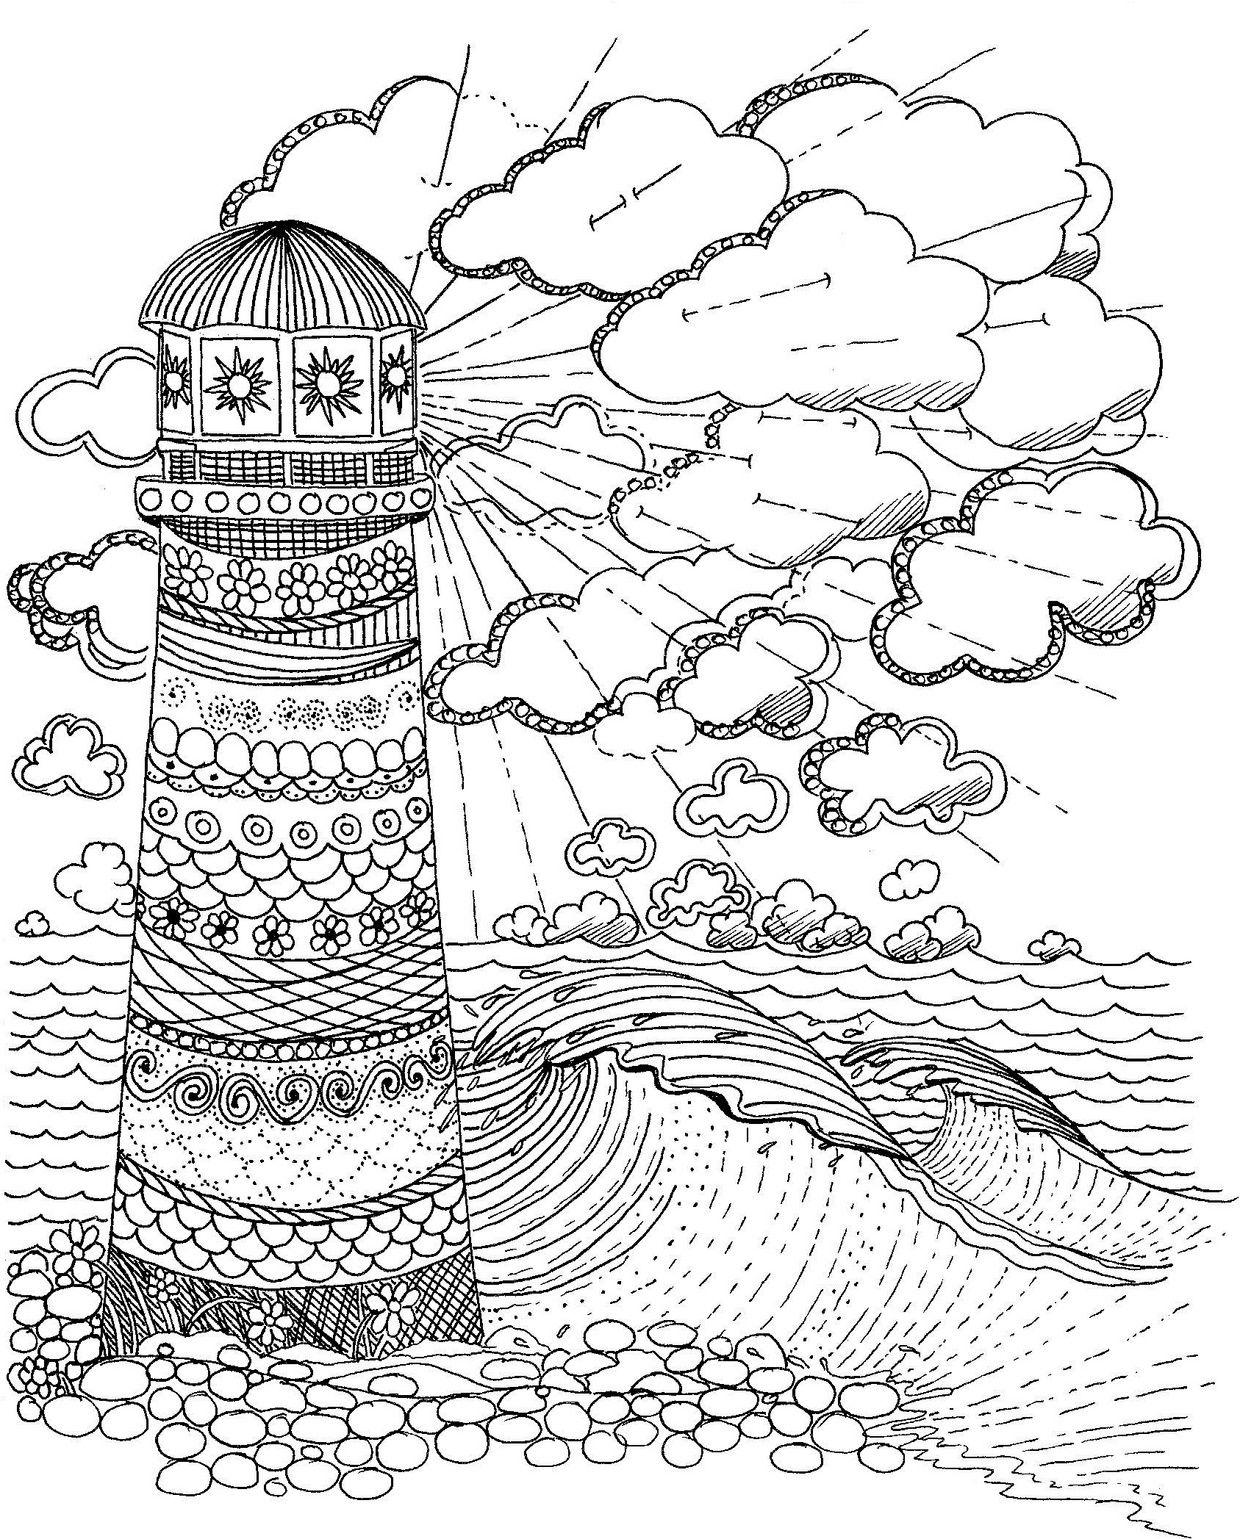 Lighthouse Coloring Page | Colorear, Plantas y Paisajes